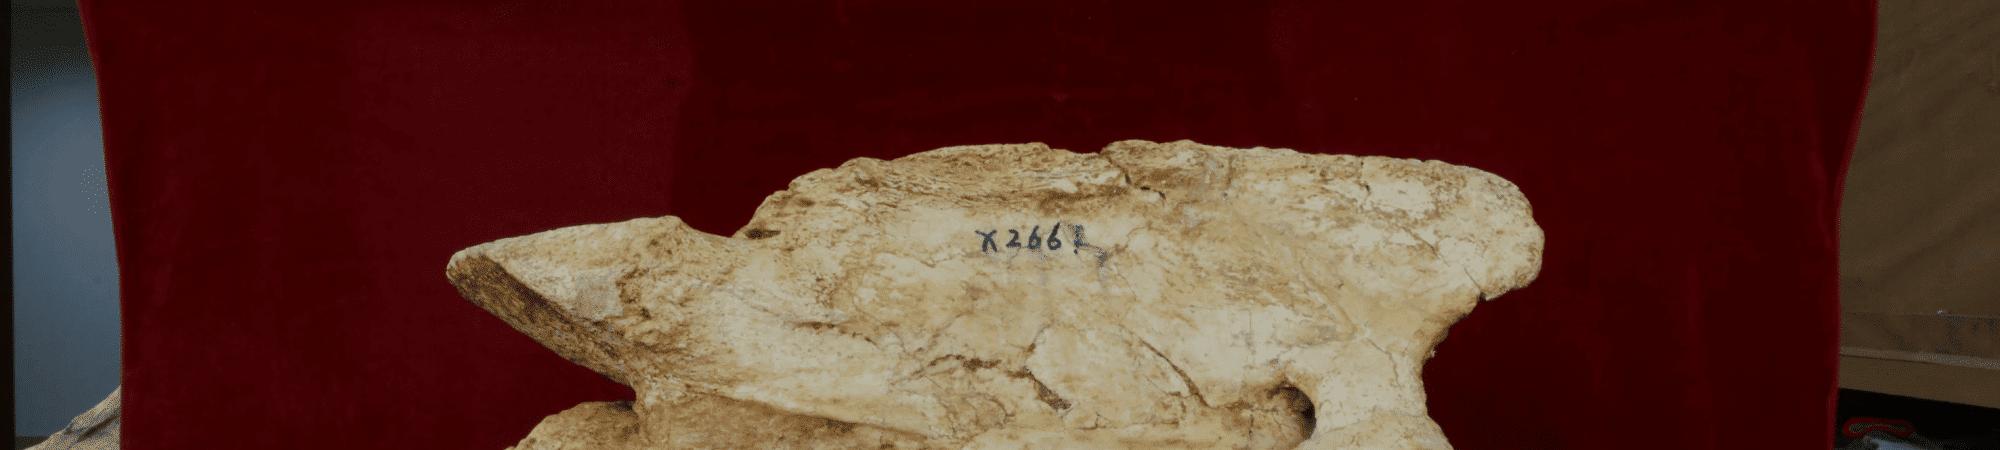 Fóssil de rinoceronte gigante